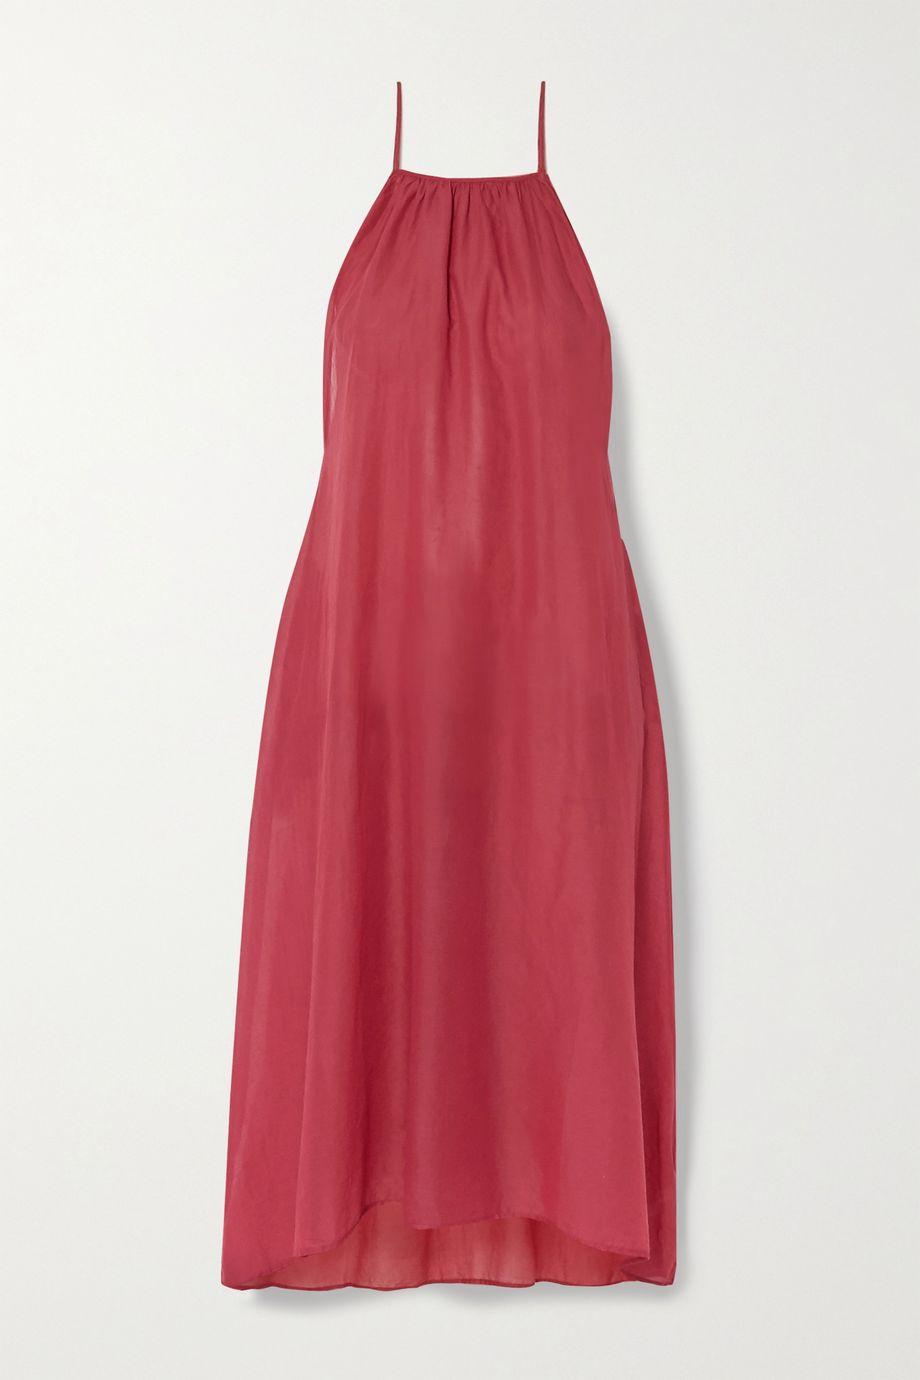 Skin Bridget cotton-voile midi dress